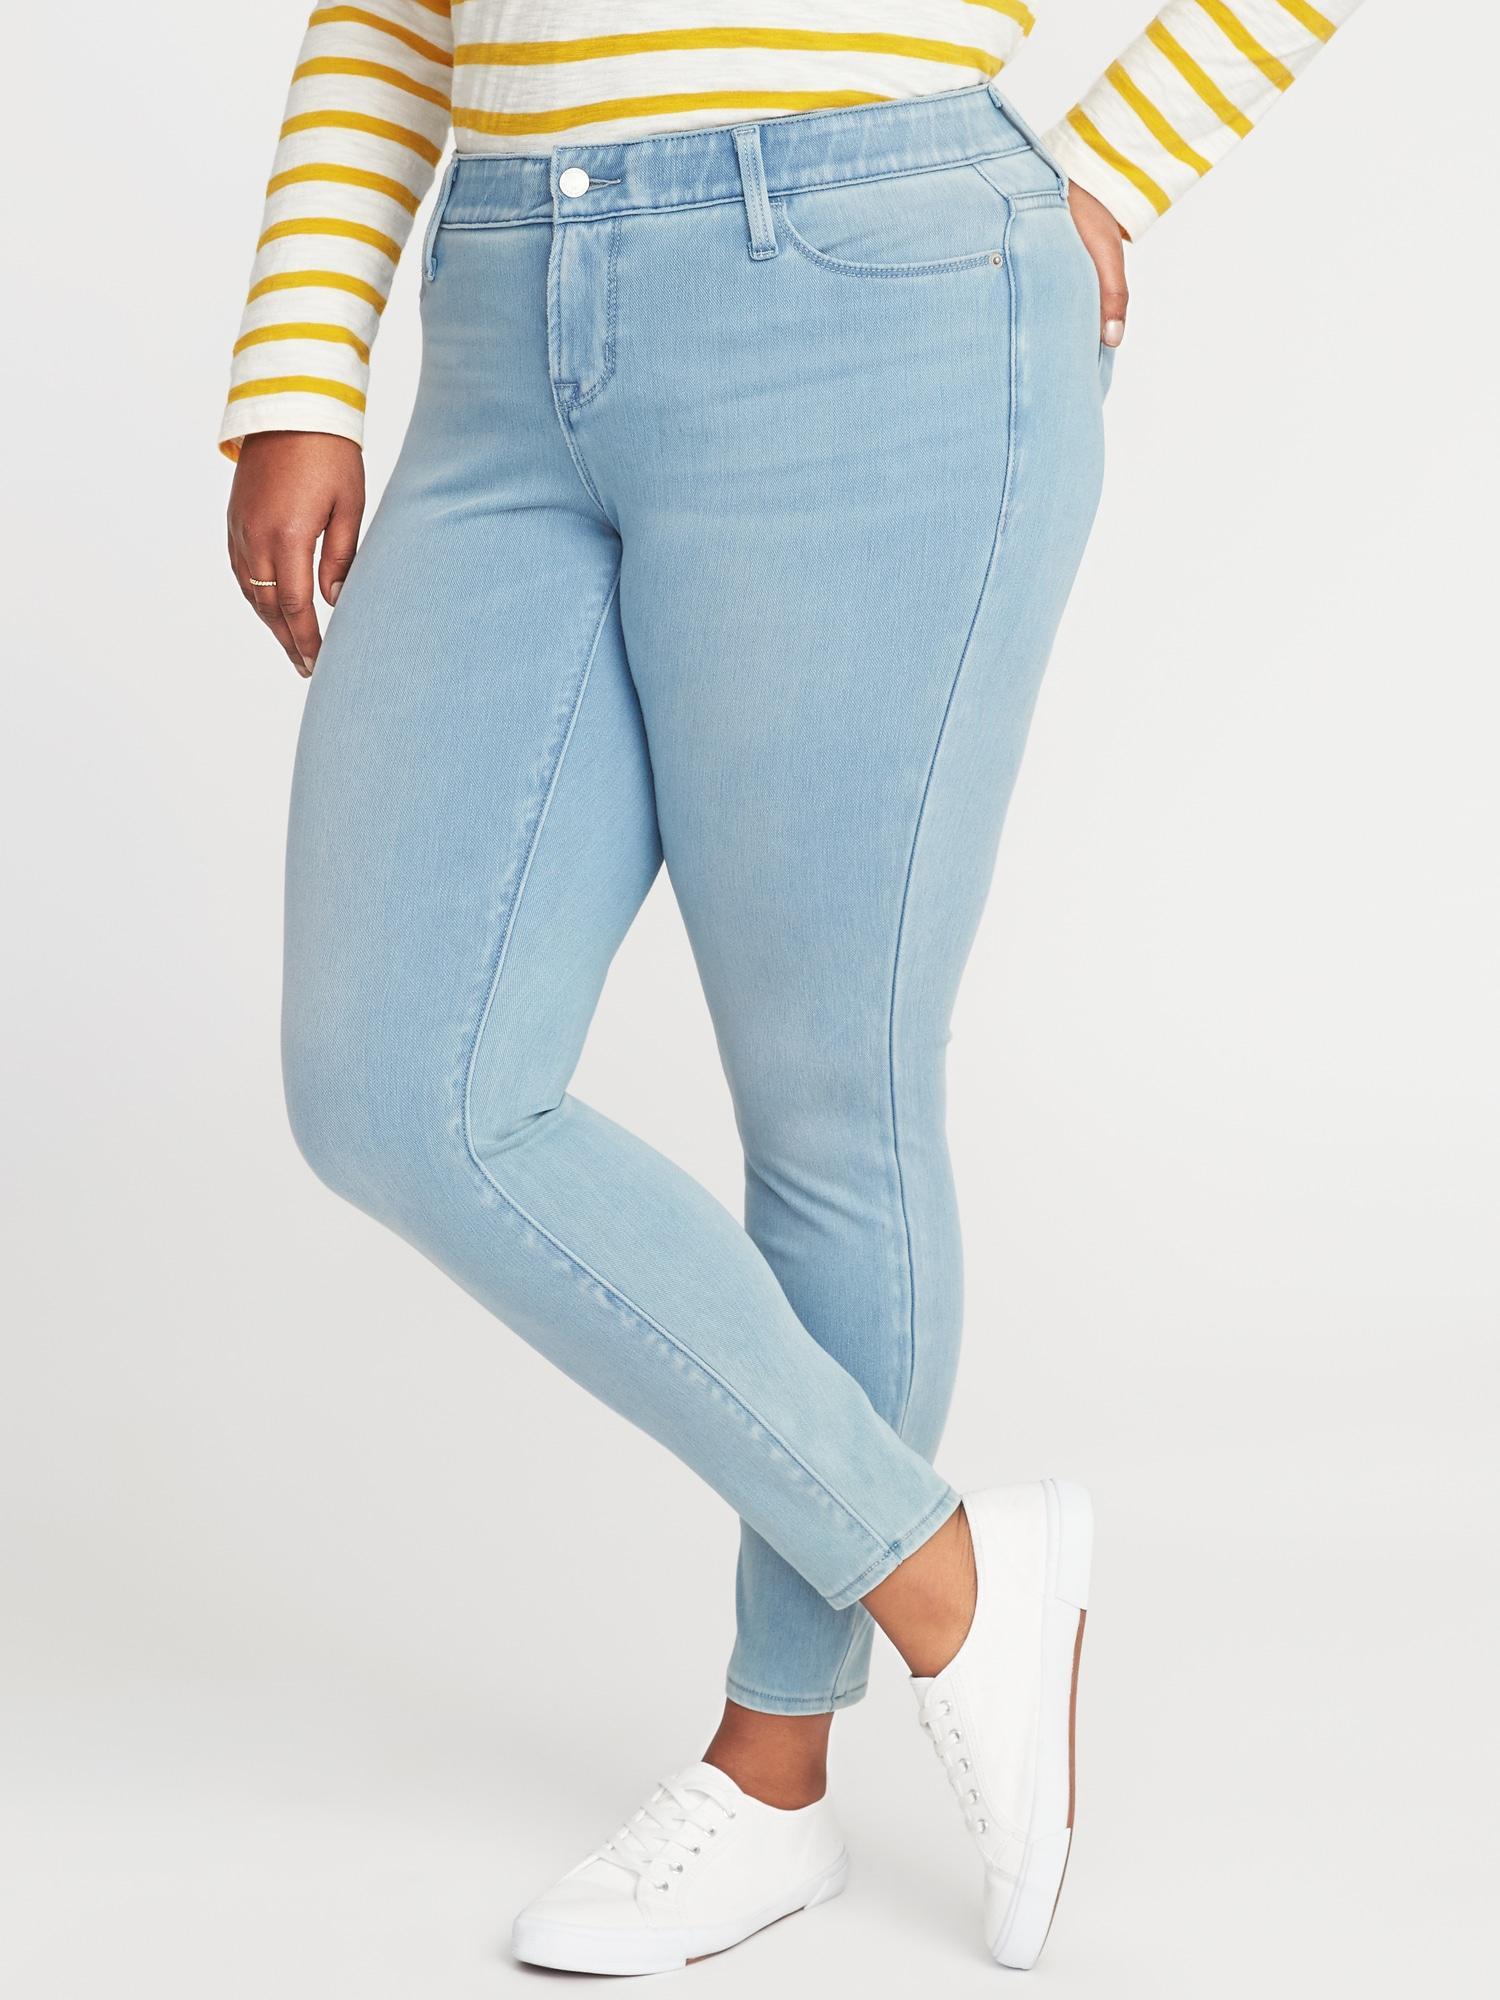 8e383c86c8e Old Navy. Women s Blue High-rise Secret-slim Pockets + Waistband Rockstar  24 7 Plus-size Jeans